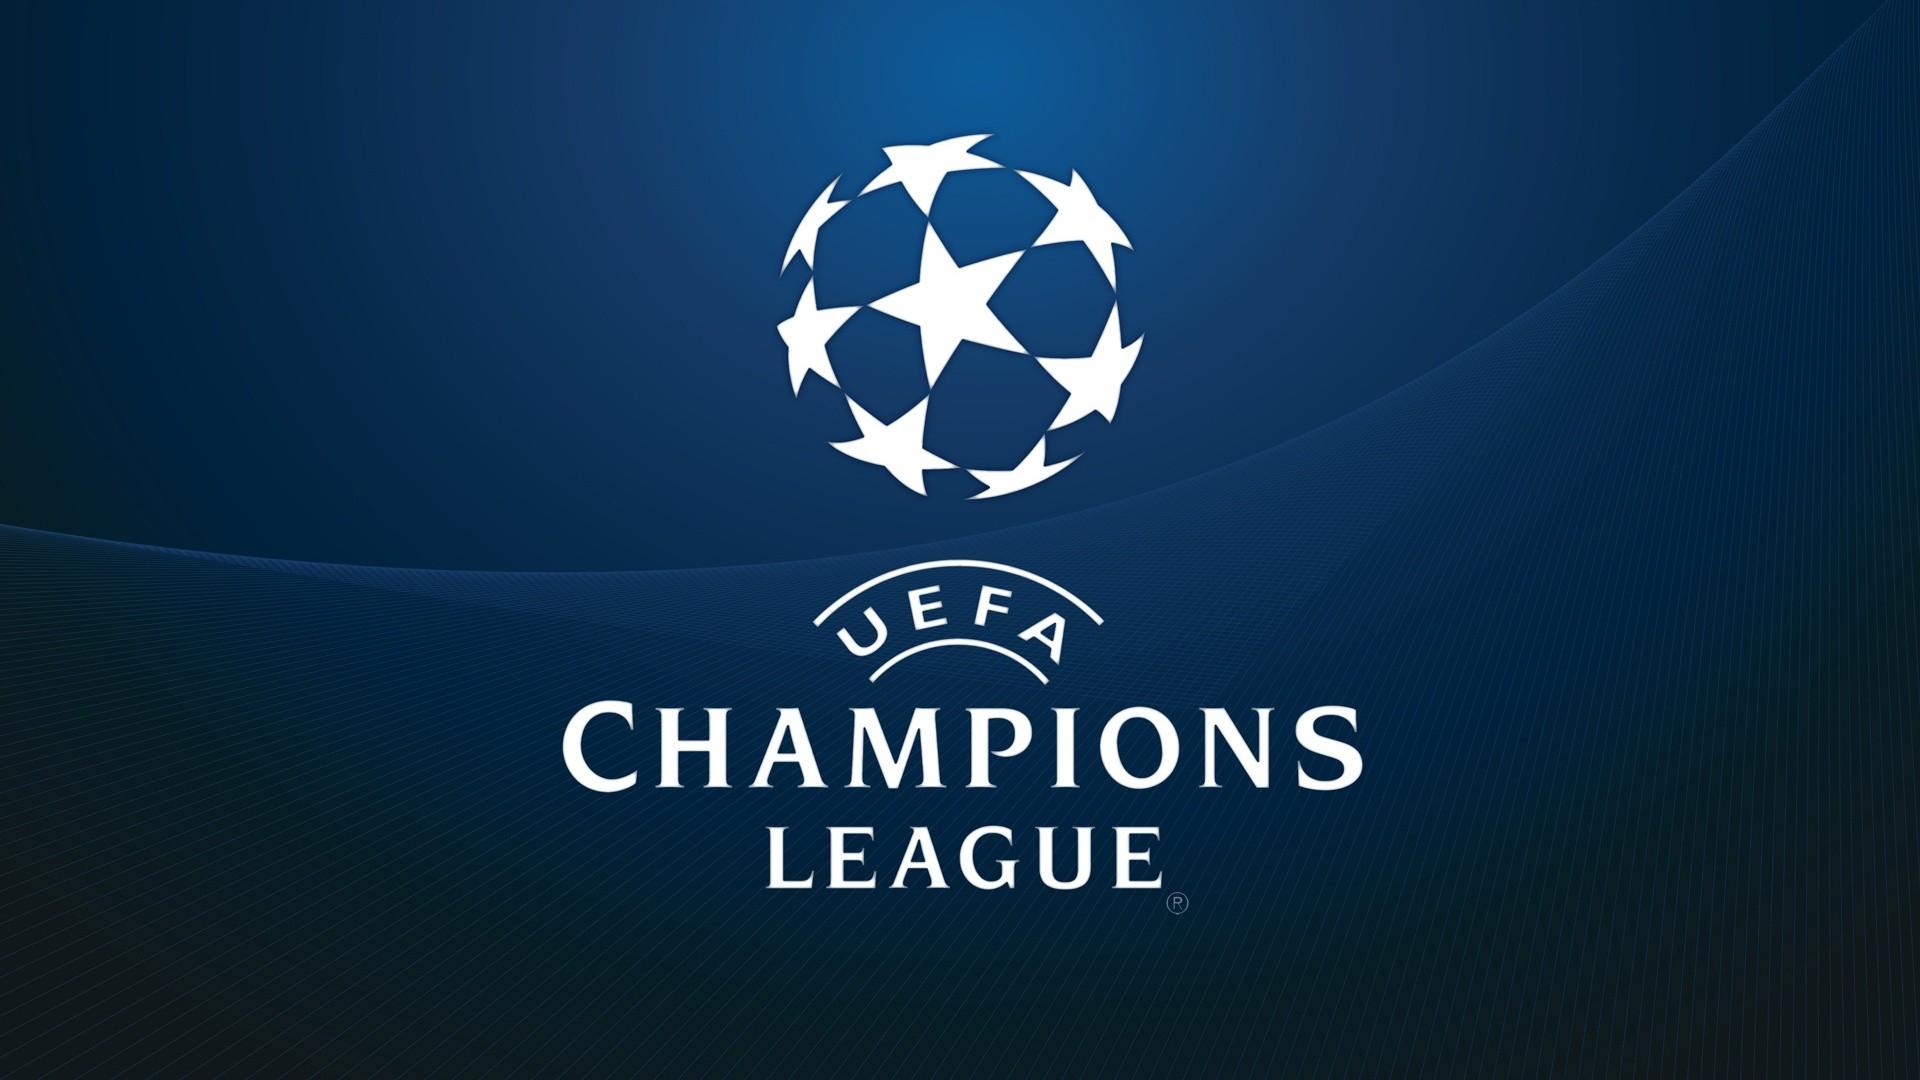 UEFA Champions League : Quarter Final Draw